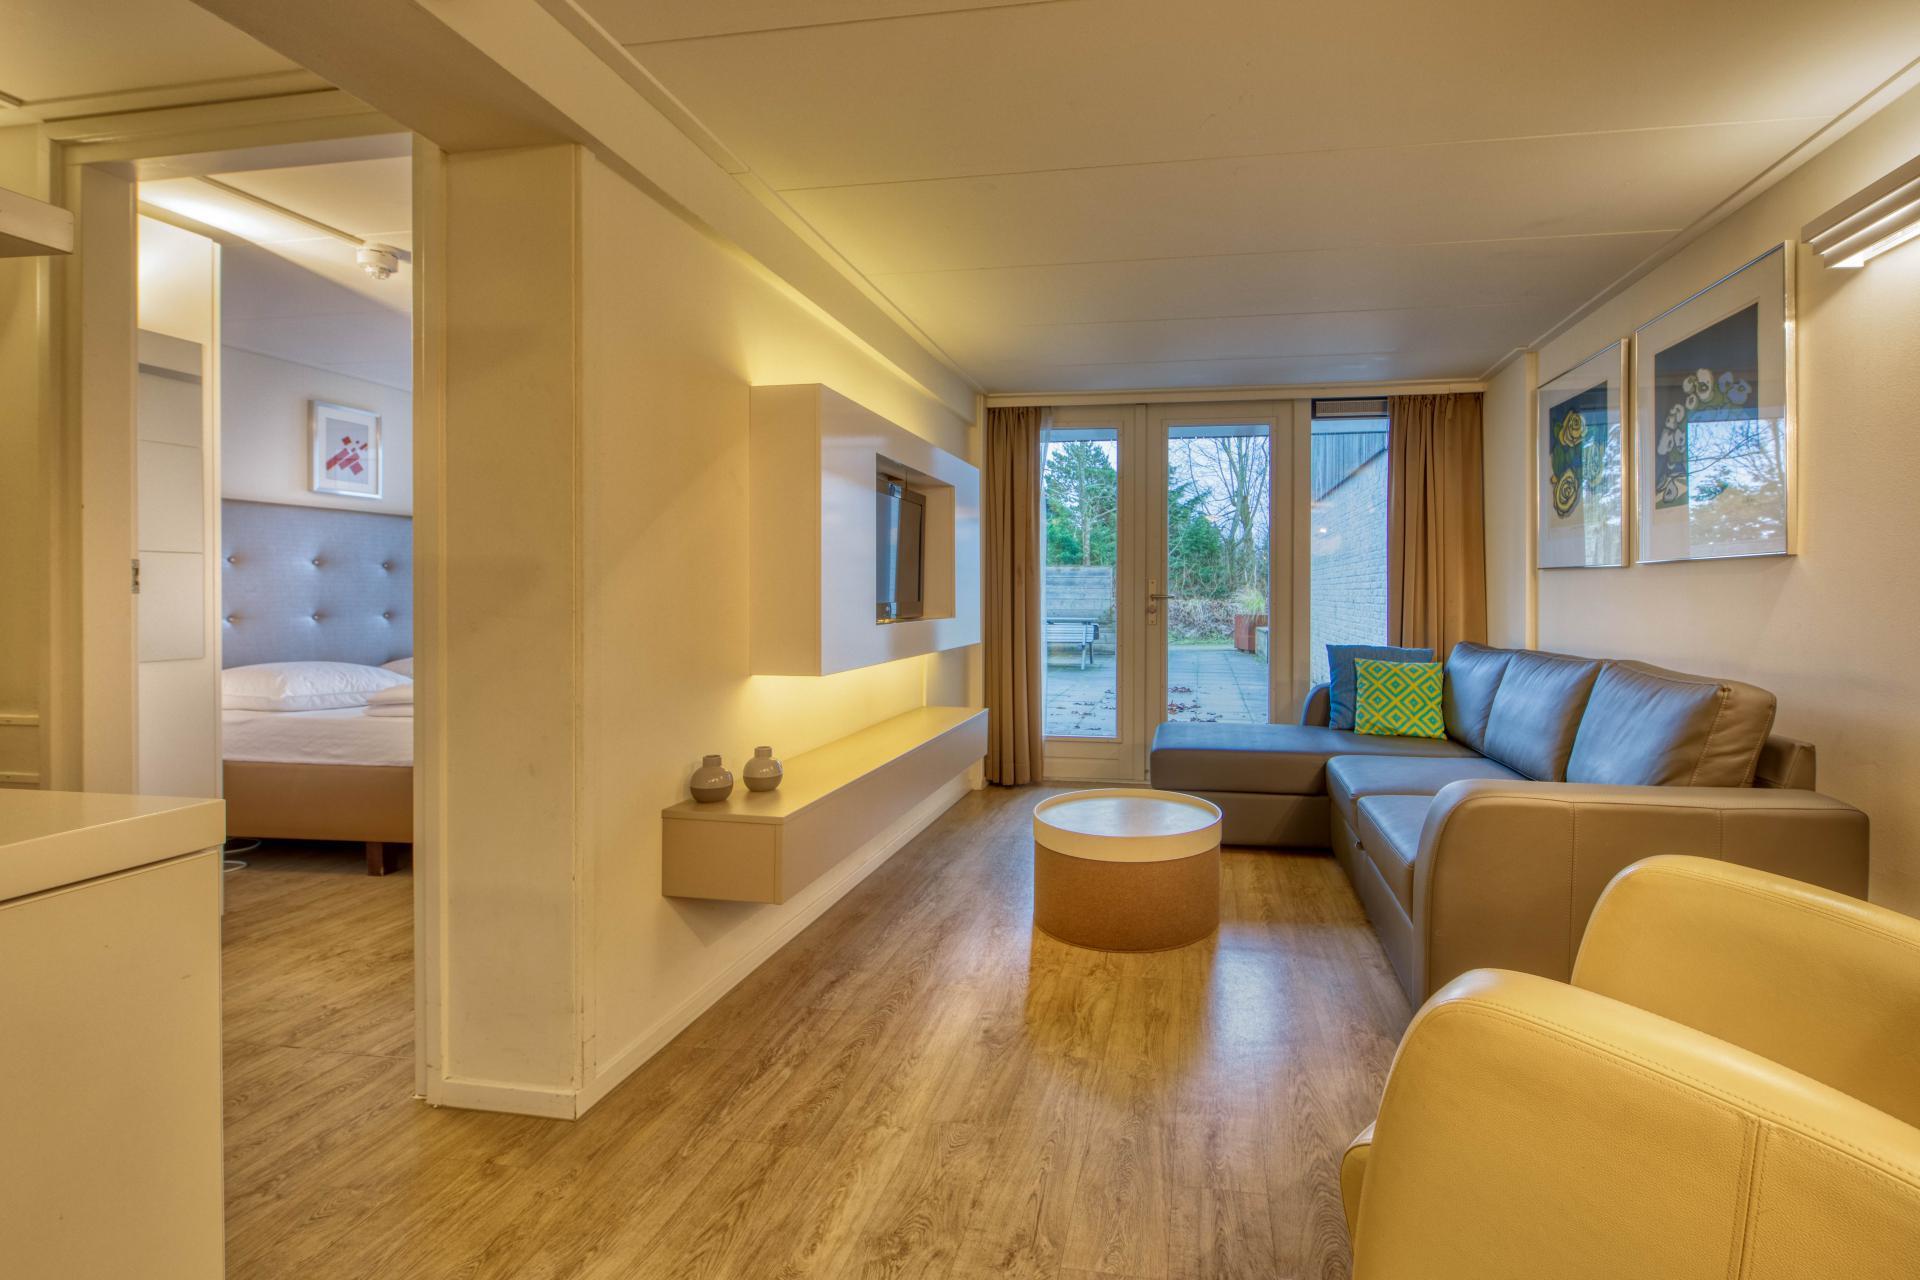 Strand Resort Schier Appartement 3 woonkamer en slaapkamer